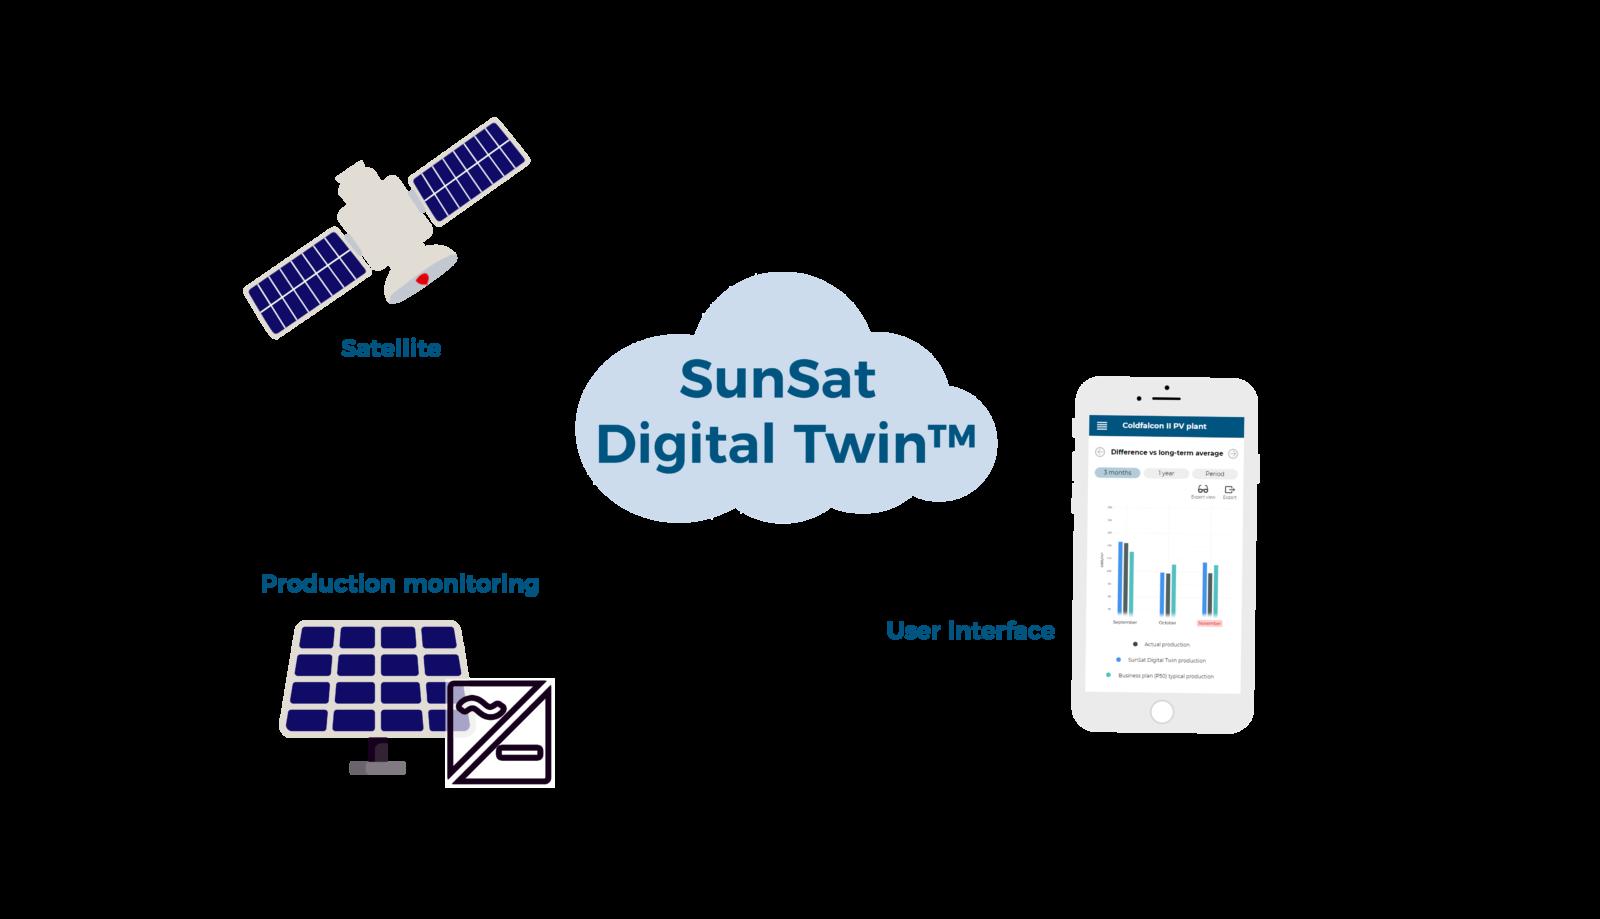 Solar Asset Management mit SunSat™ Digital Twin